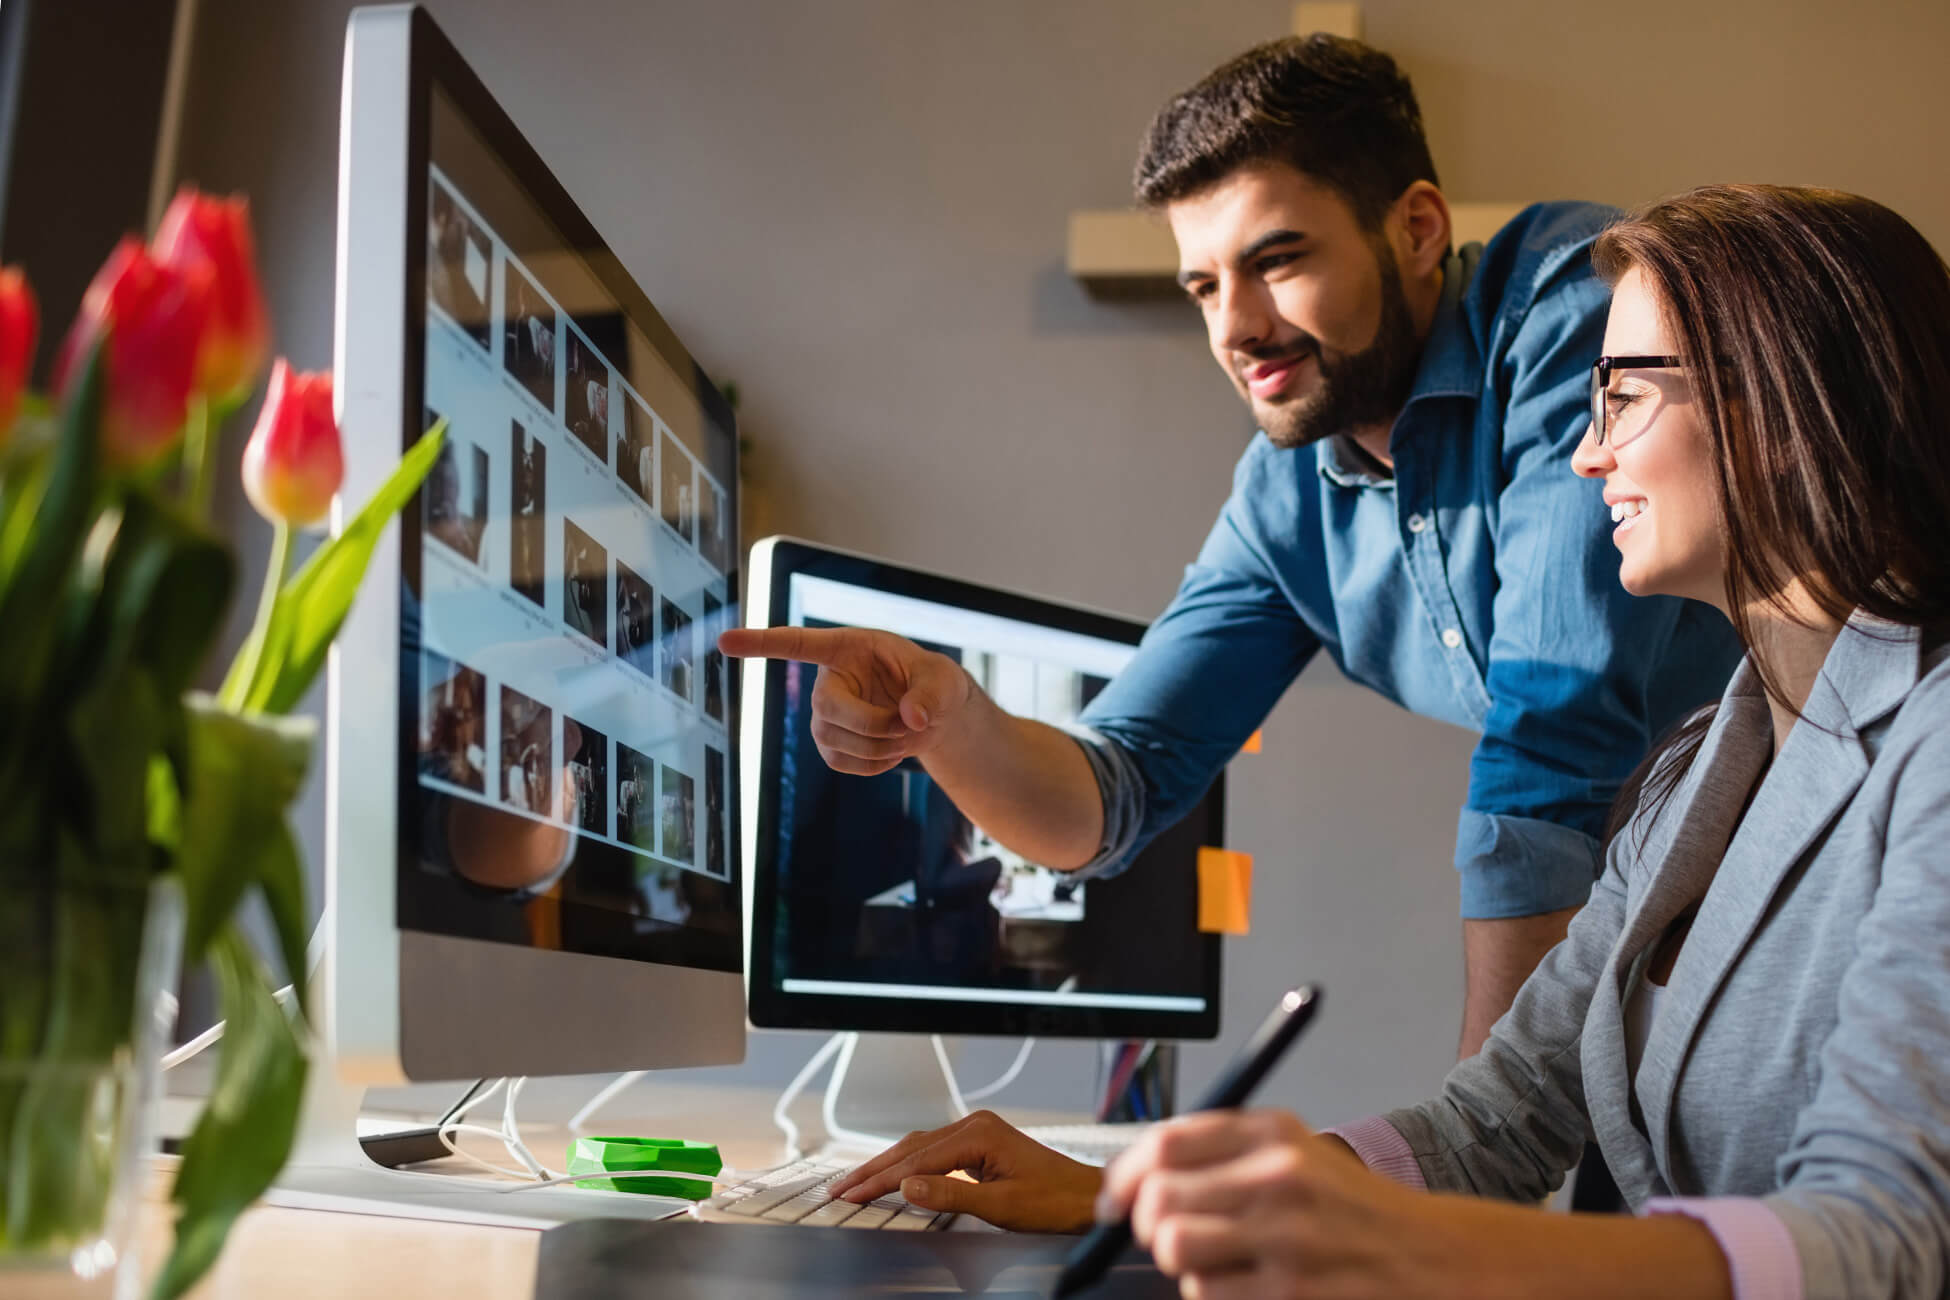 Web design trends - Digital Marketing Blog